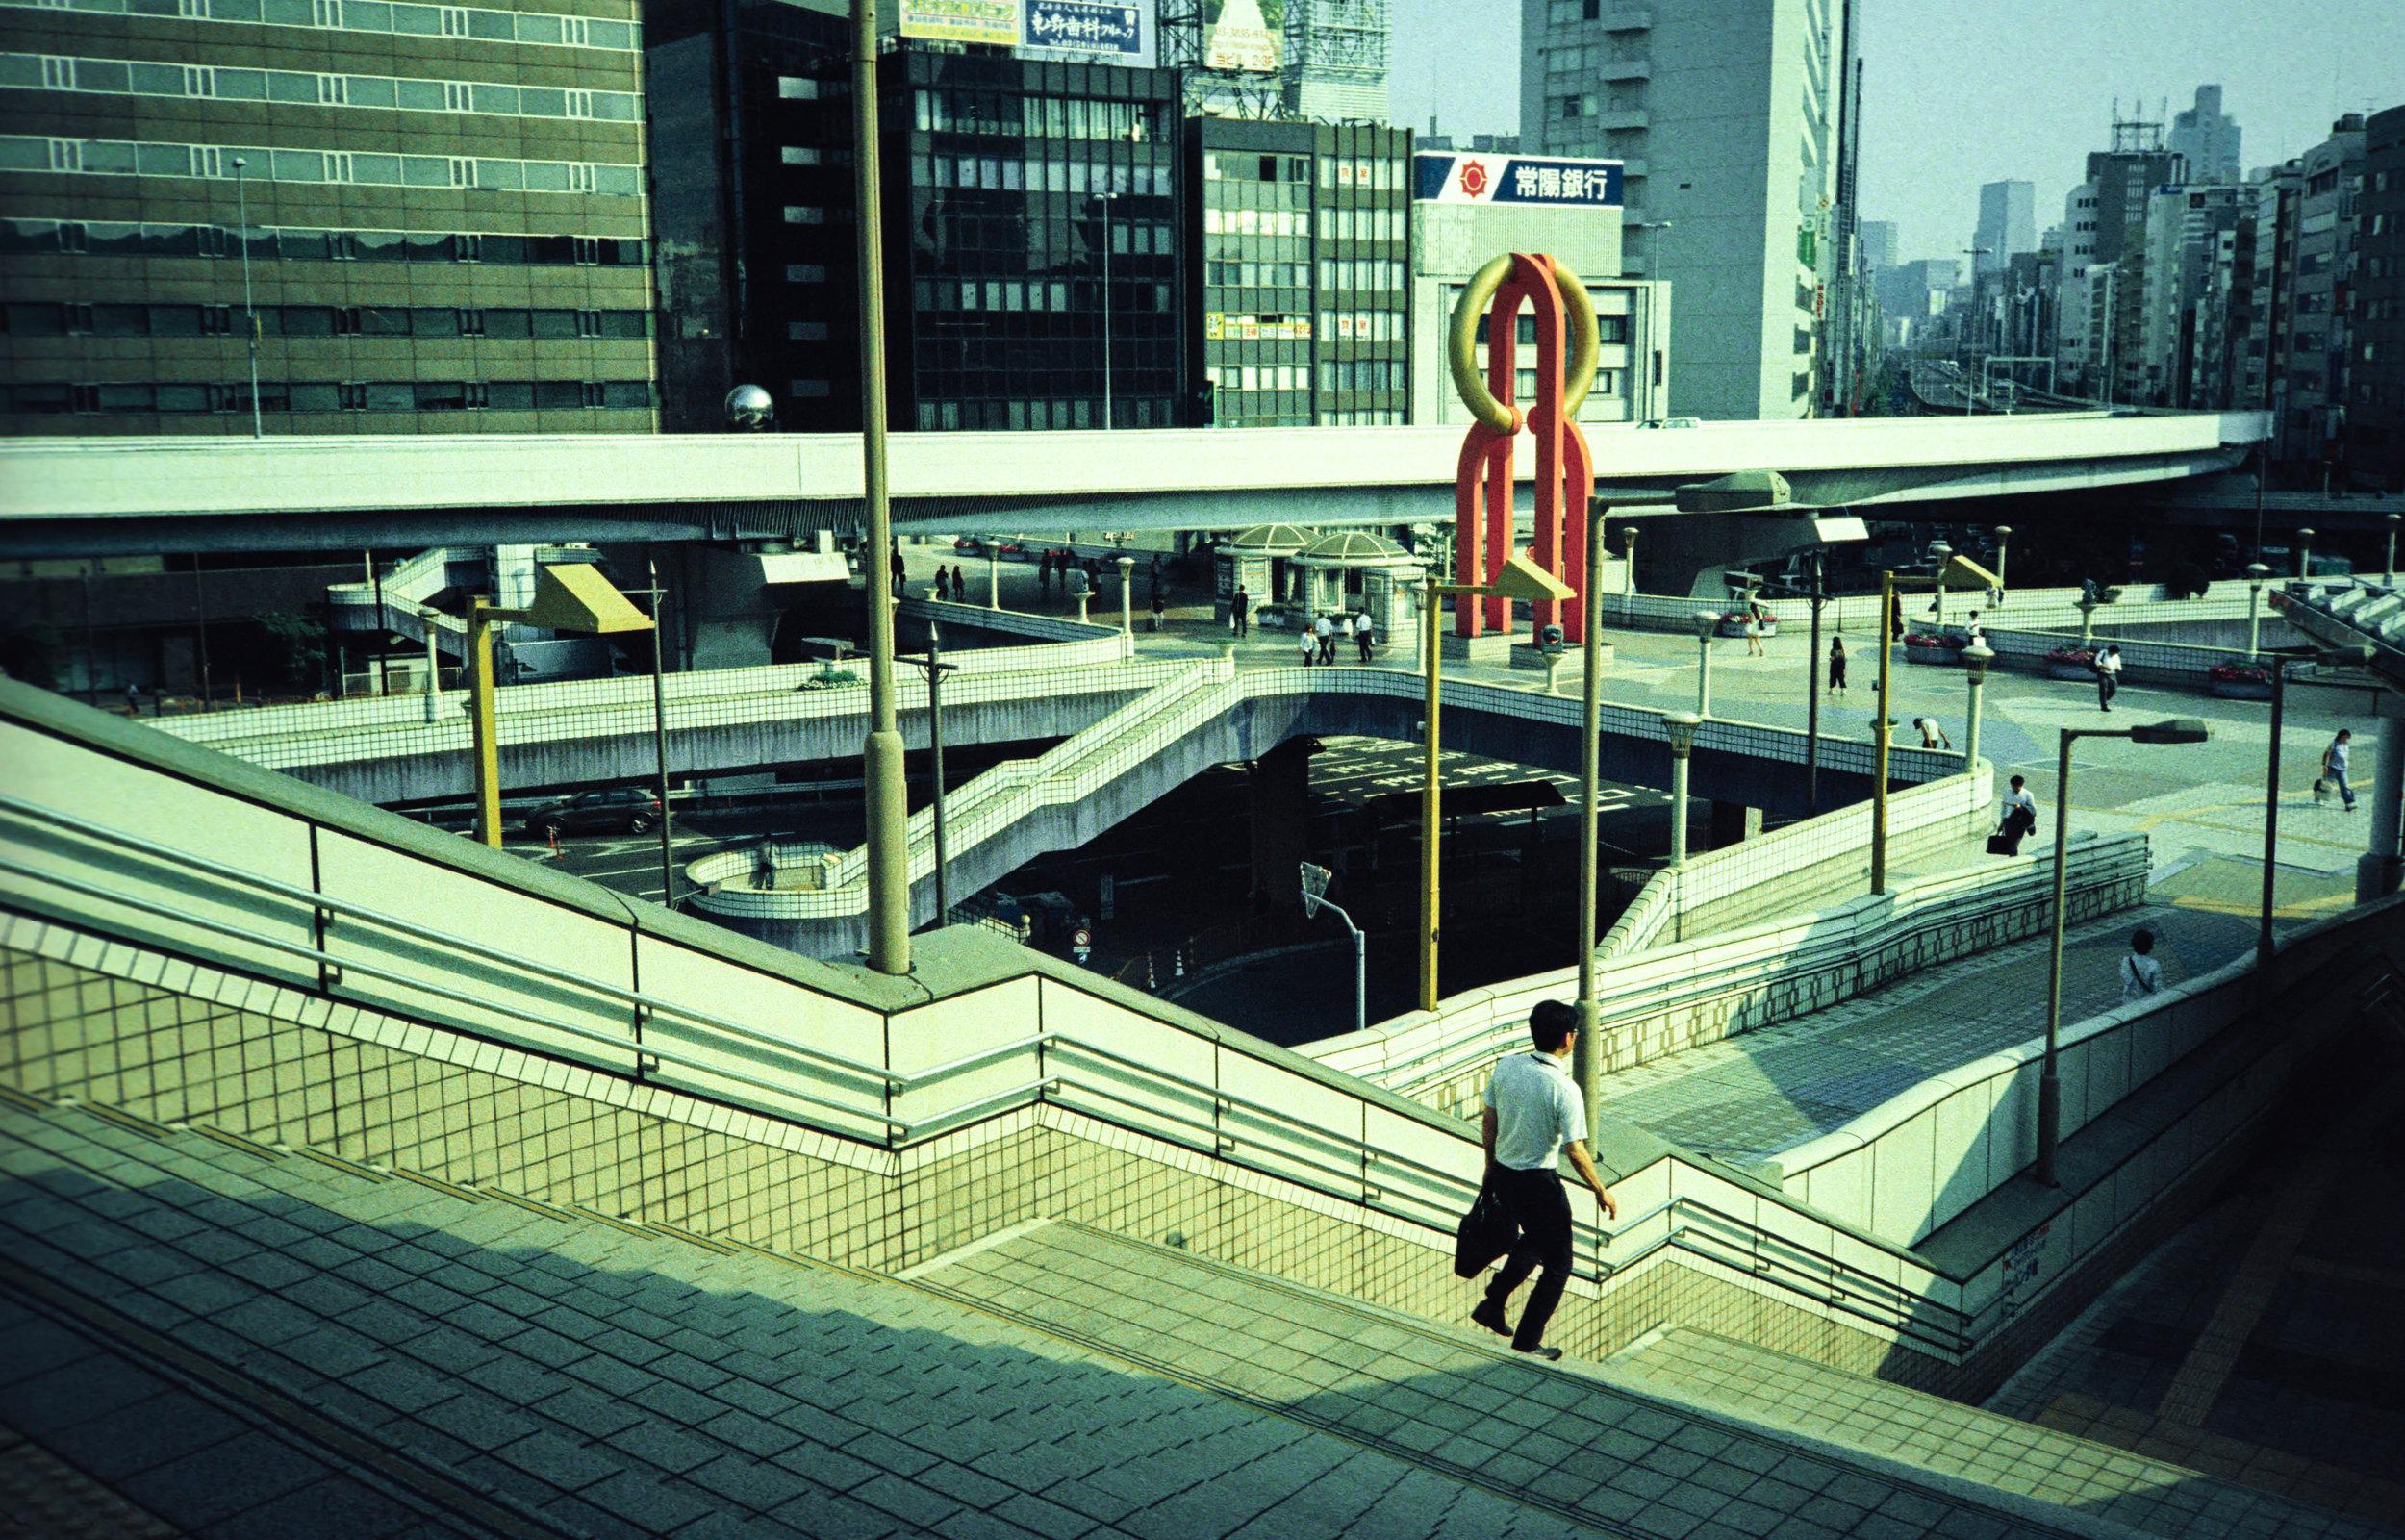 Some of Roger's film photographs of Ueno Station (Tokyo, Japan)